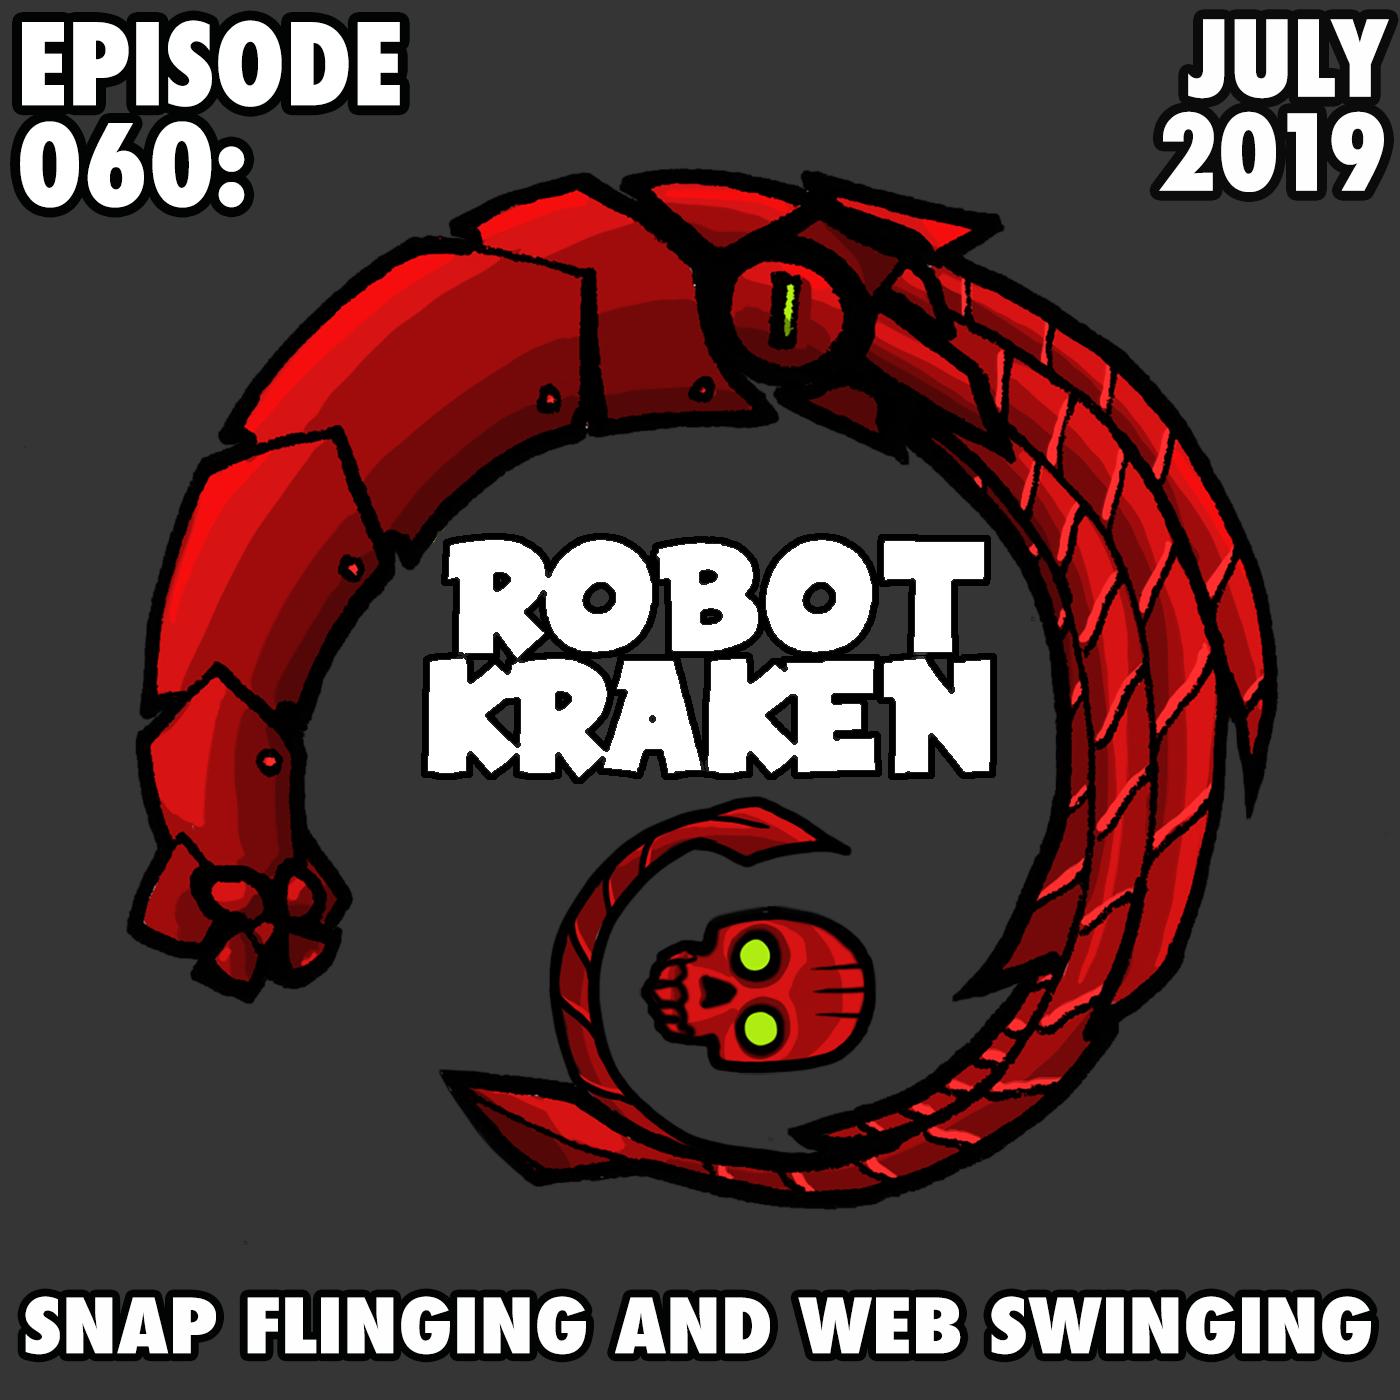 Robot-Kraken-060-Cover.png